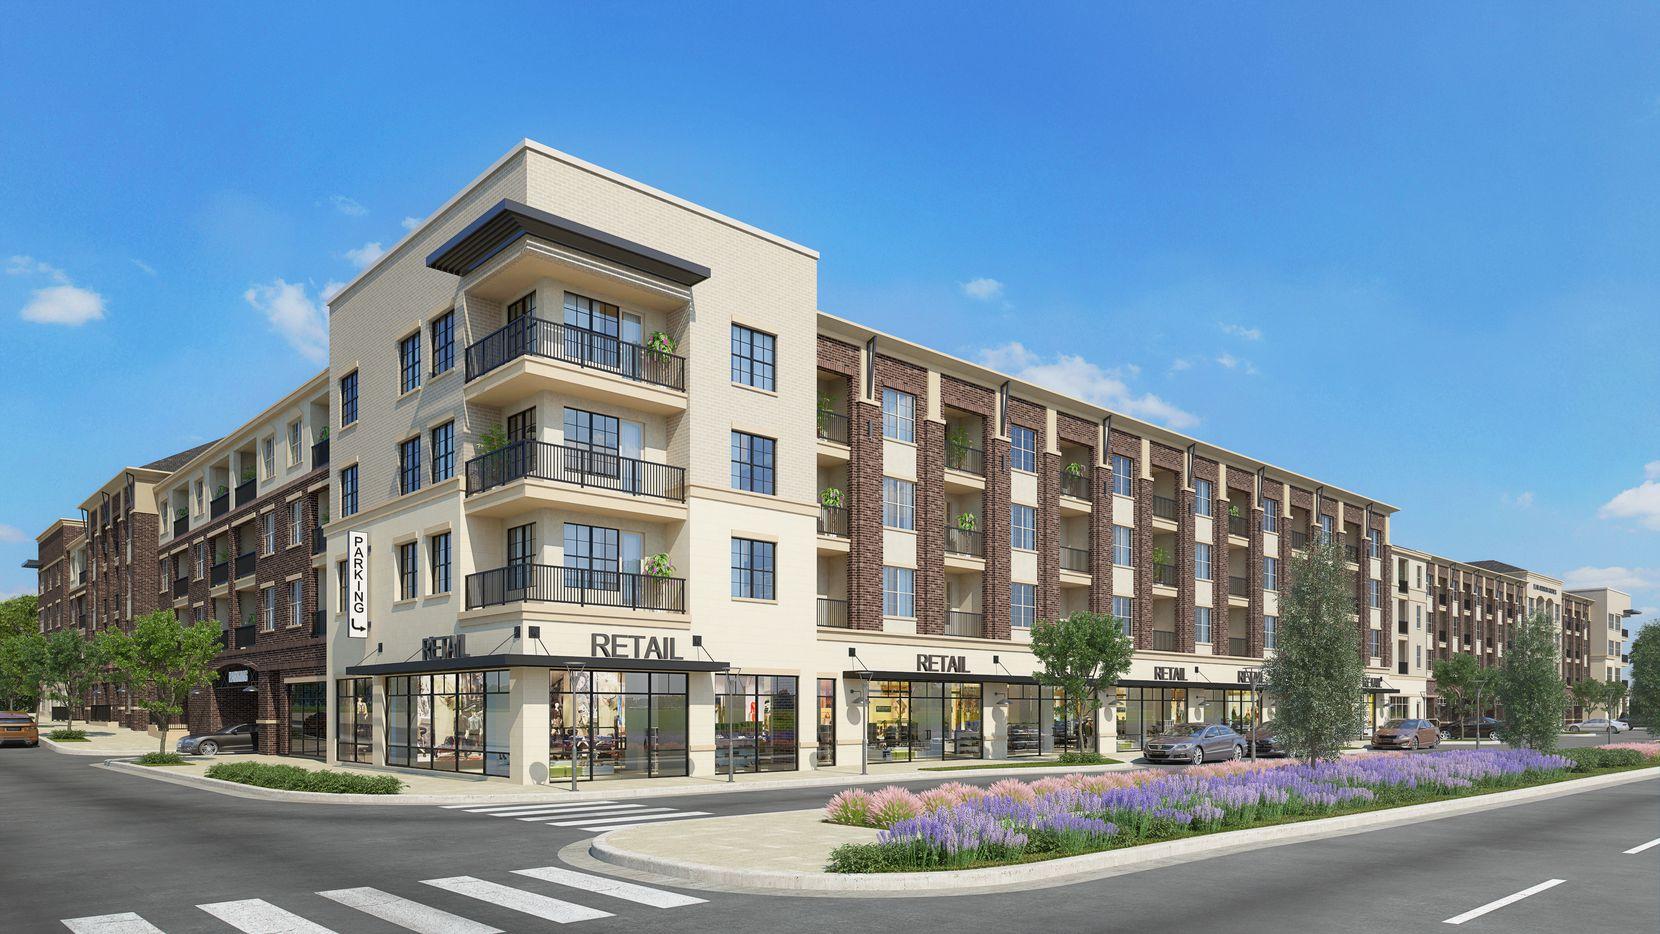 Greystar's Elan Addison Grove rental community will start opening in the fall.